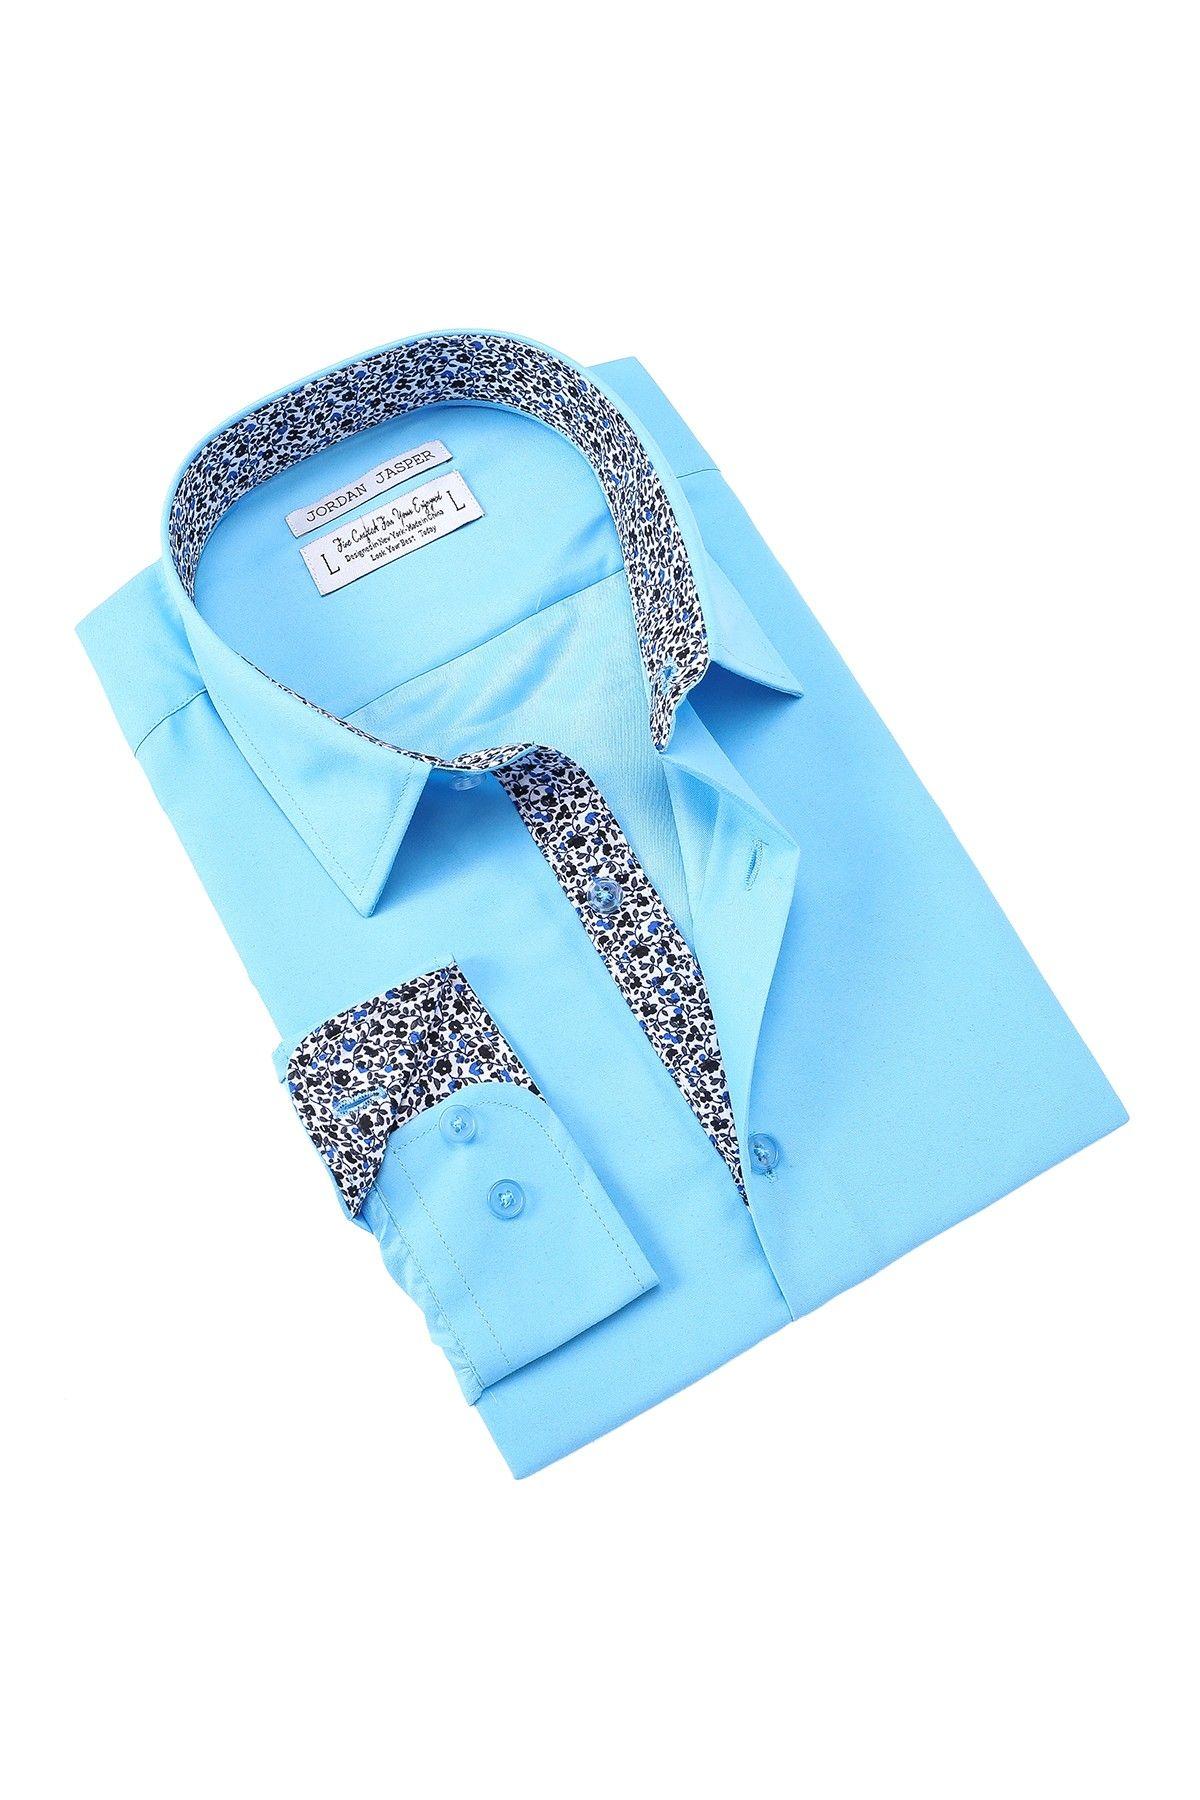 18e03c4d324c04 Jordan Jasper Novart Slim Fit Shirt